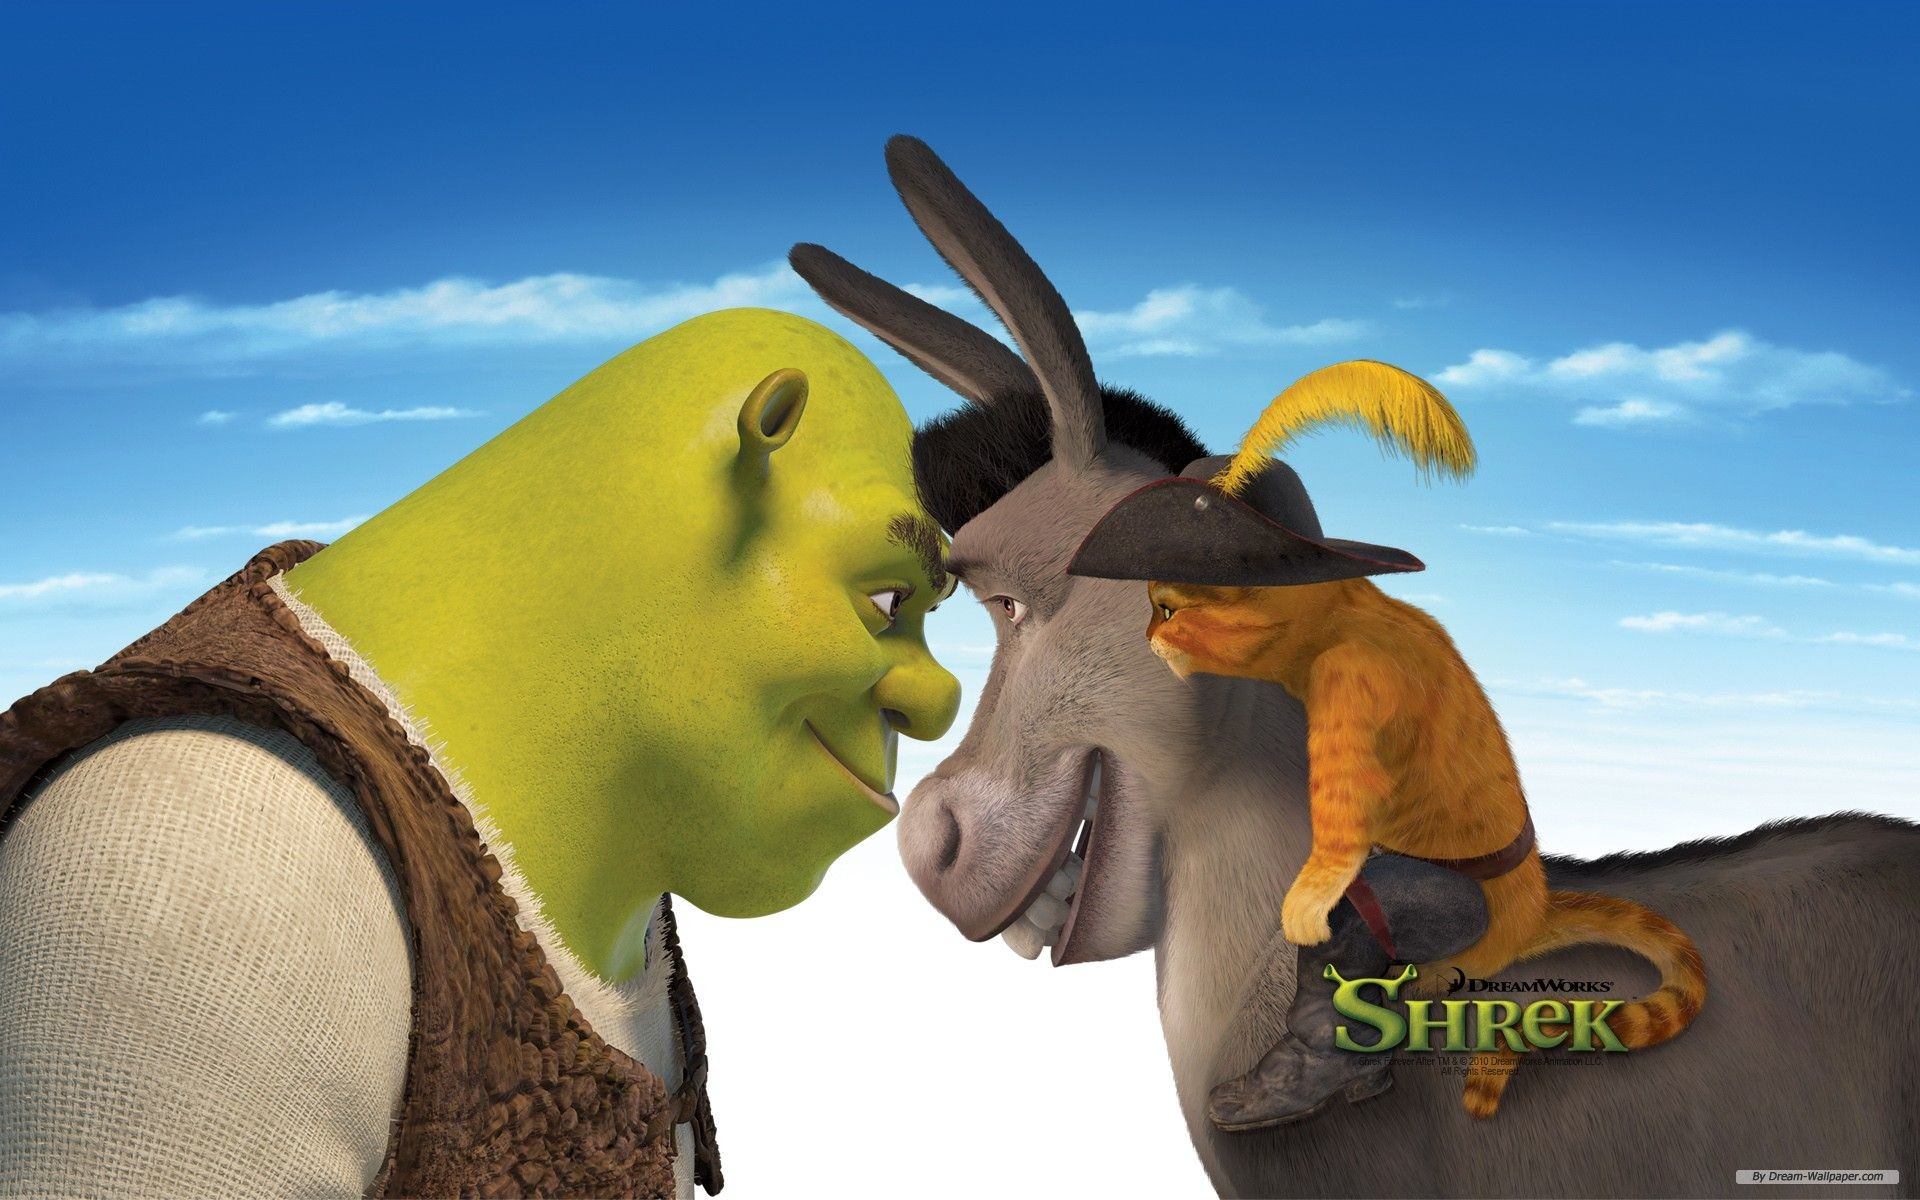 Shrek Princesses HD Wallpaper | Wallpapers | Pinterest | Shrek and Hd  wallpaper